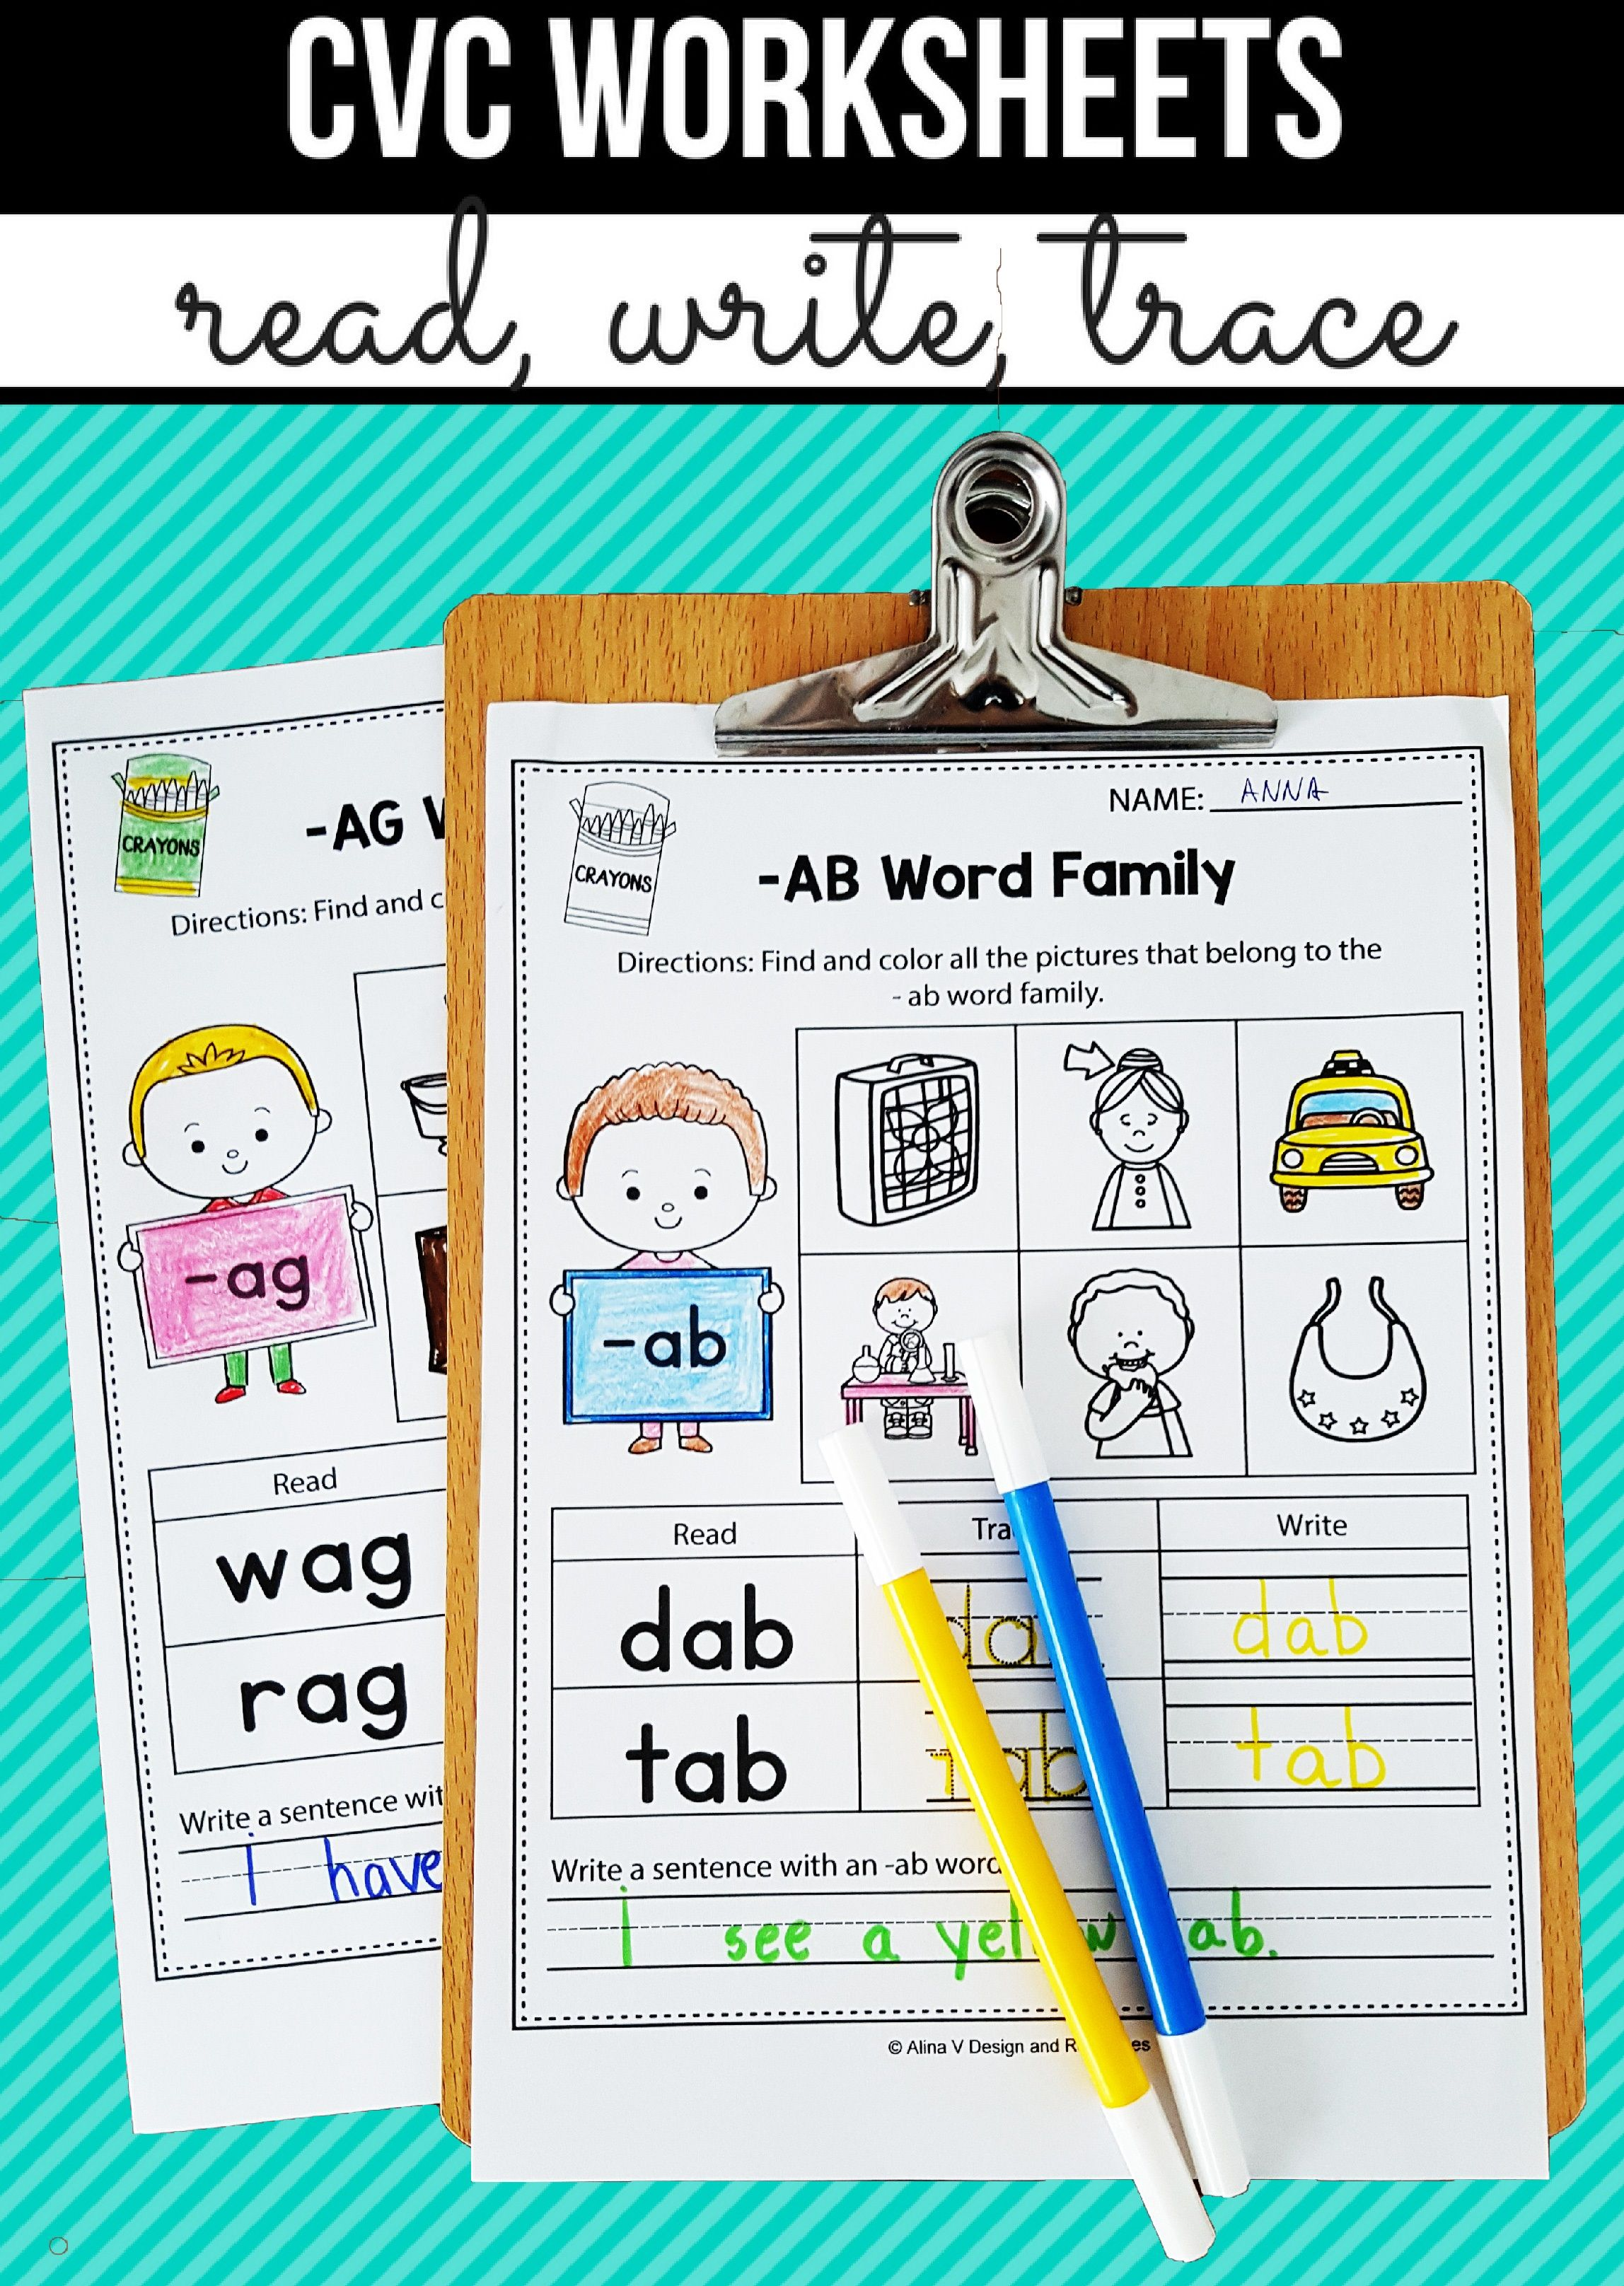 hight resolution of CVC Words Worksheets All Vowels CVC Word Families Worksheets Kindergarten    Cvc words